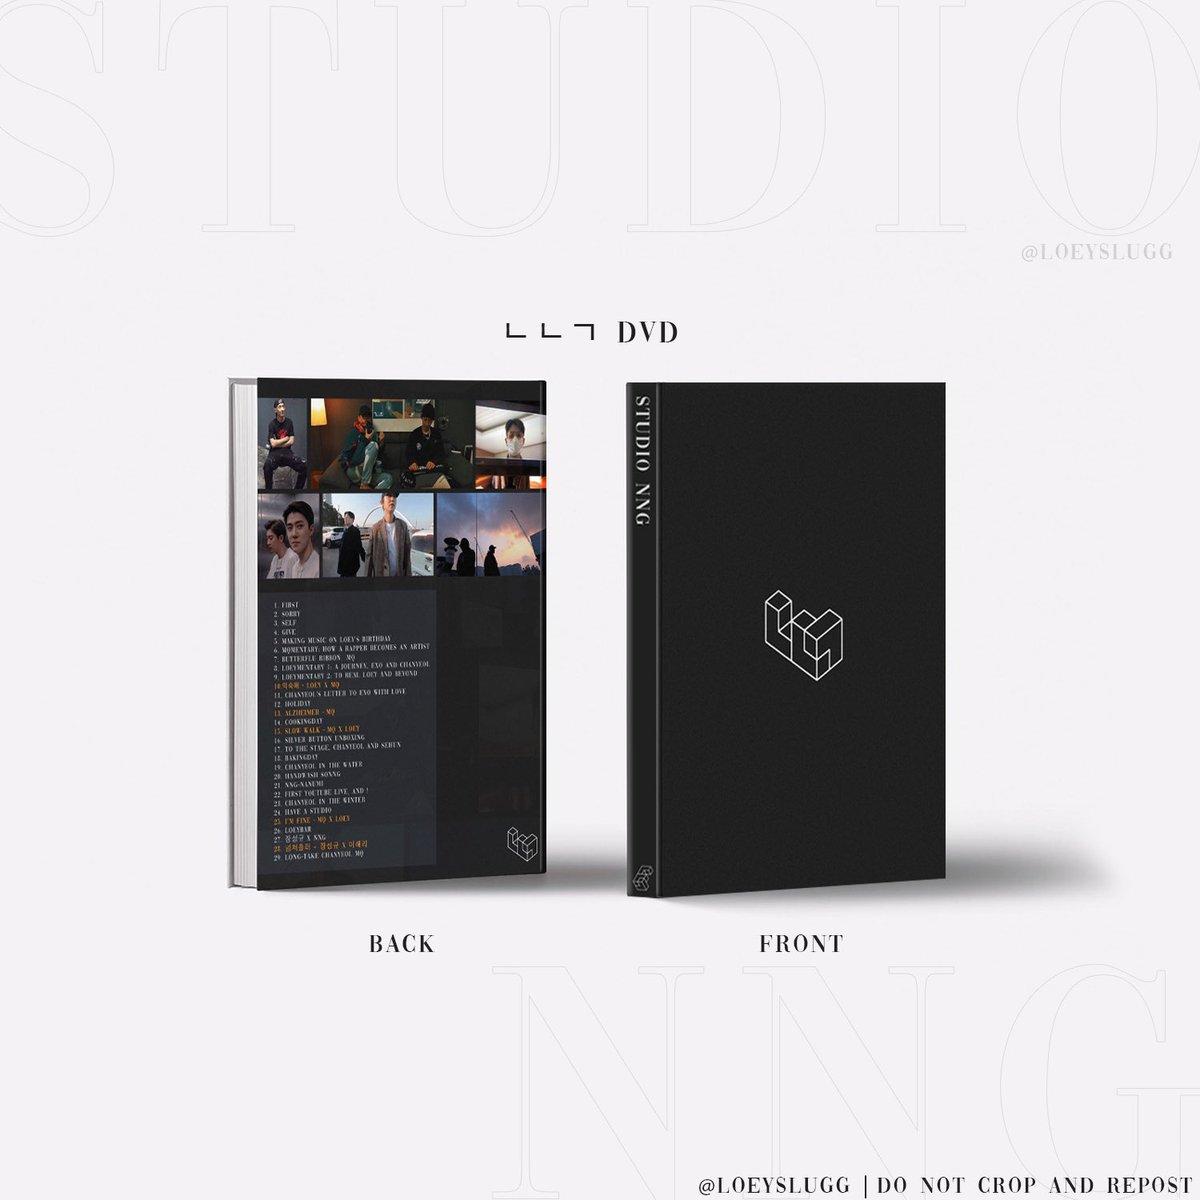 Studio NNG DVD ♥️  Pre-order here: 😉 https://t.co/sRVemPQdWr  #AGiftForChanyeol #여리에게ㅇㅍㅇ  #CHANYEOL #찬열 #StudioNNG @27xCHANYEOL @STUDIONNGxLOEY https://t.co/nHU50FpF7u